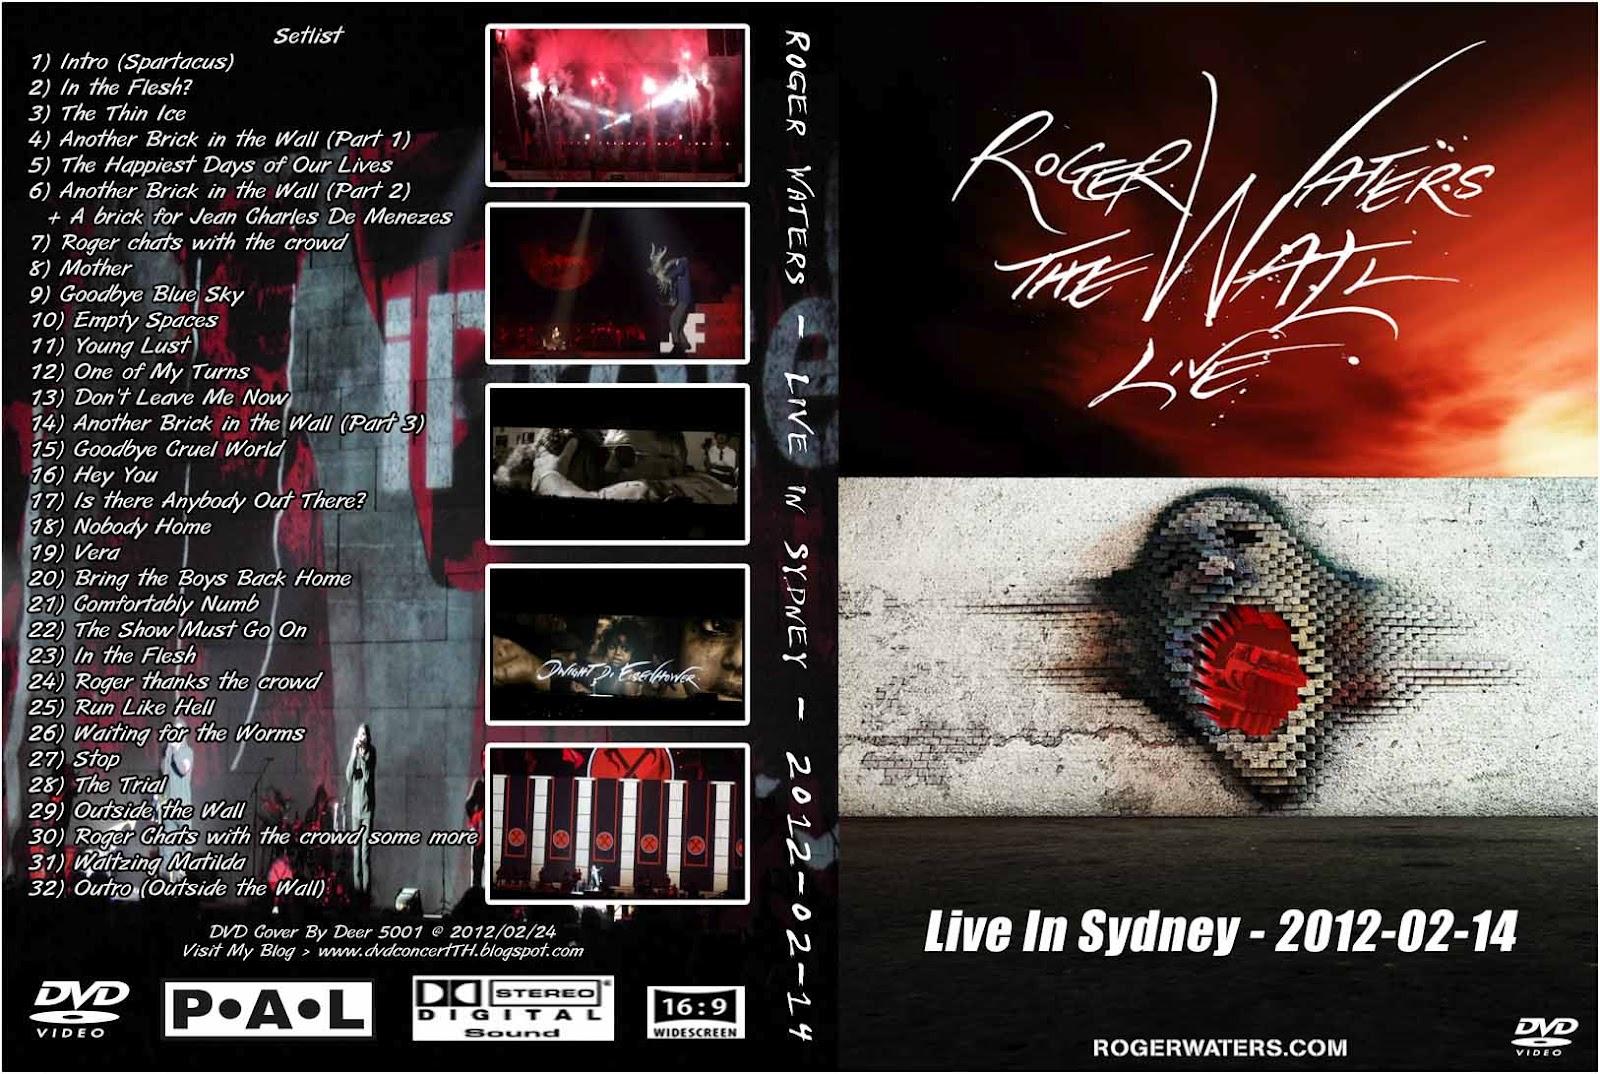 http://3.bp.blogspot.com/--0k-IO4c-t8/T0rEM9cTeQI/AAAAAAAAFHY/41eQeK5PKrg/s1600/DVD+Cover+Low+Resolution+-+Roger+Waters+-+2012-02-14+-+Live+in+Sydney+.jpg